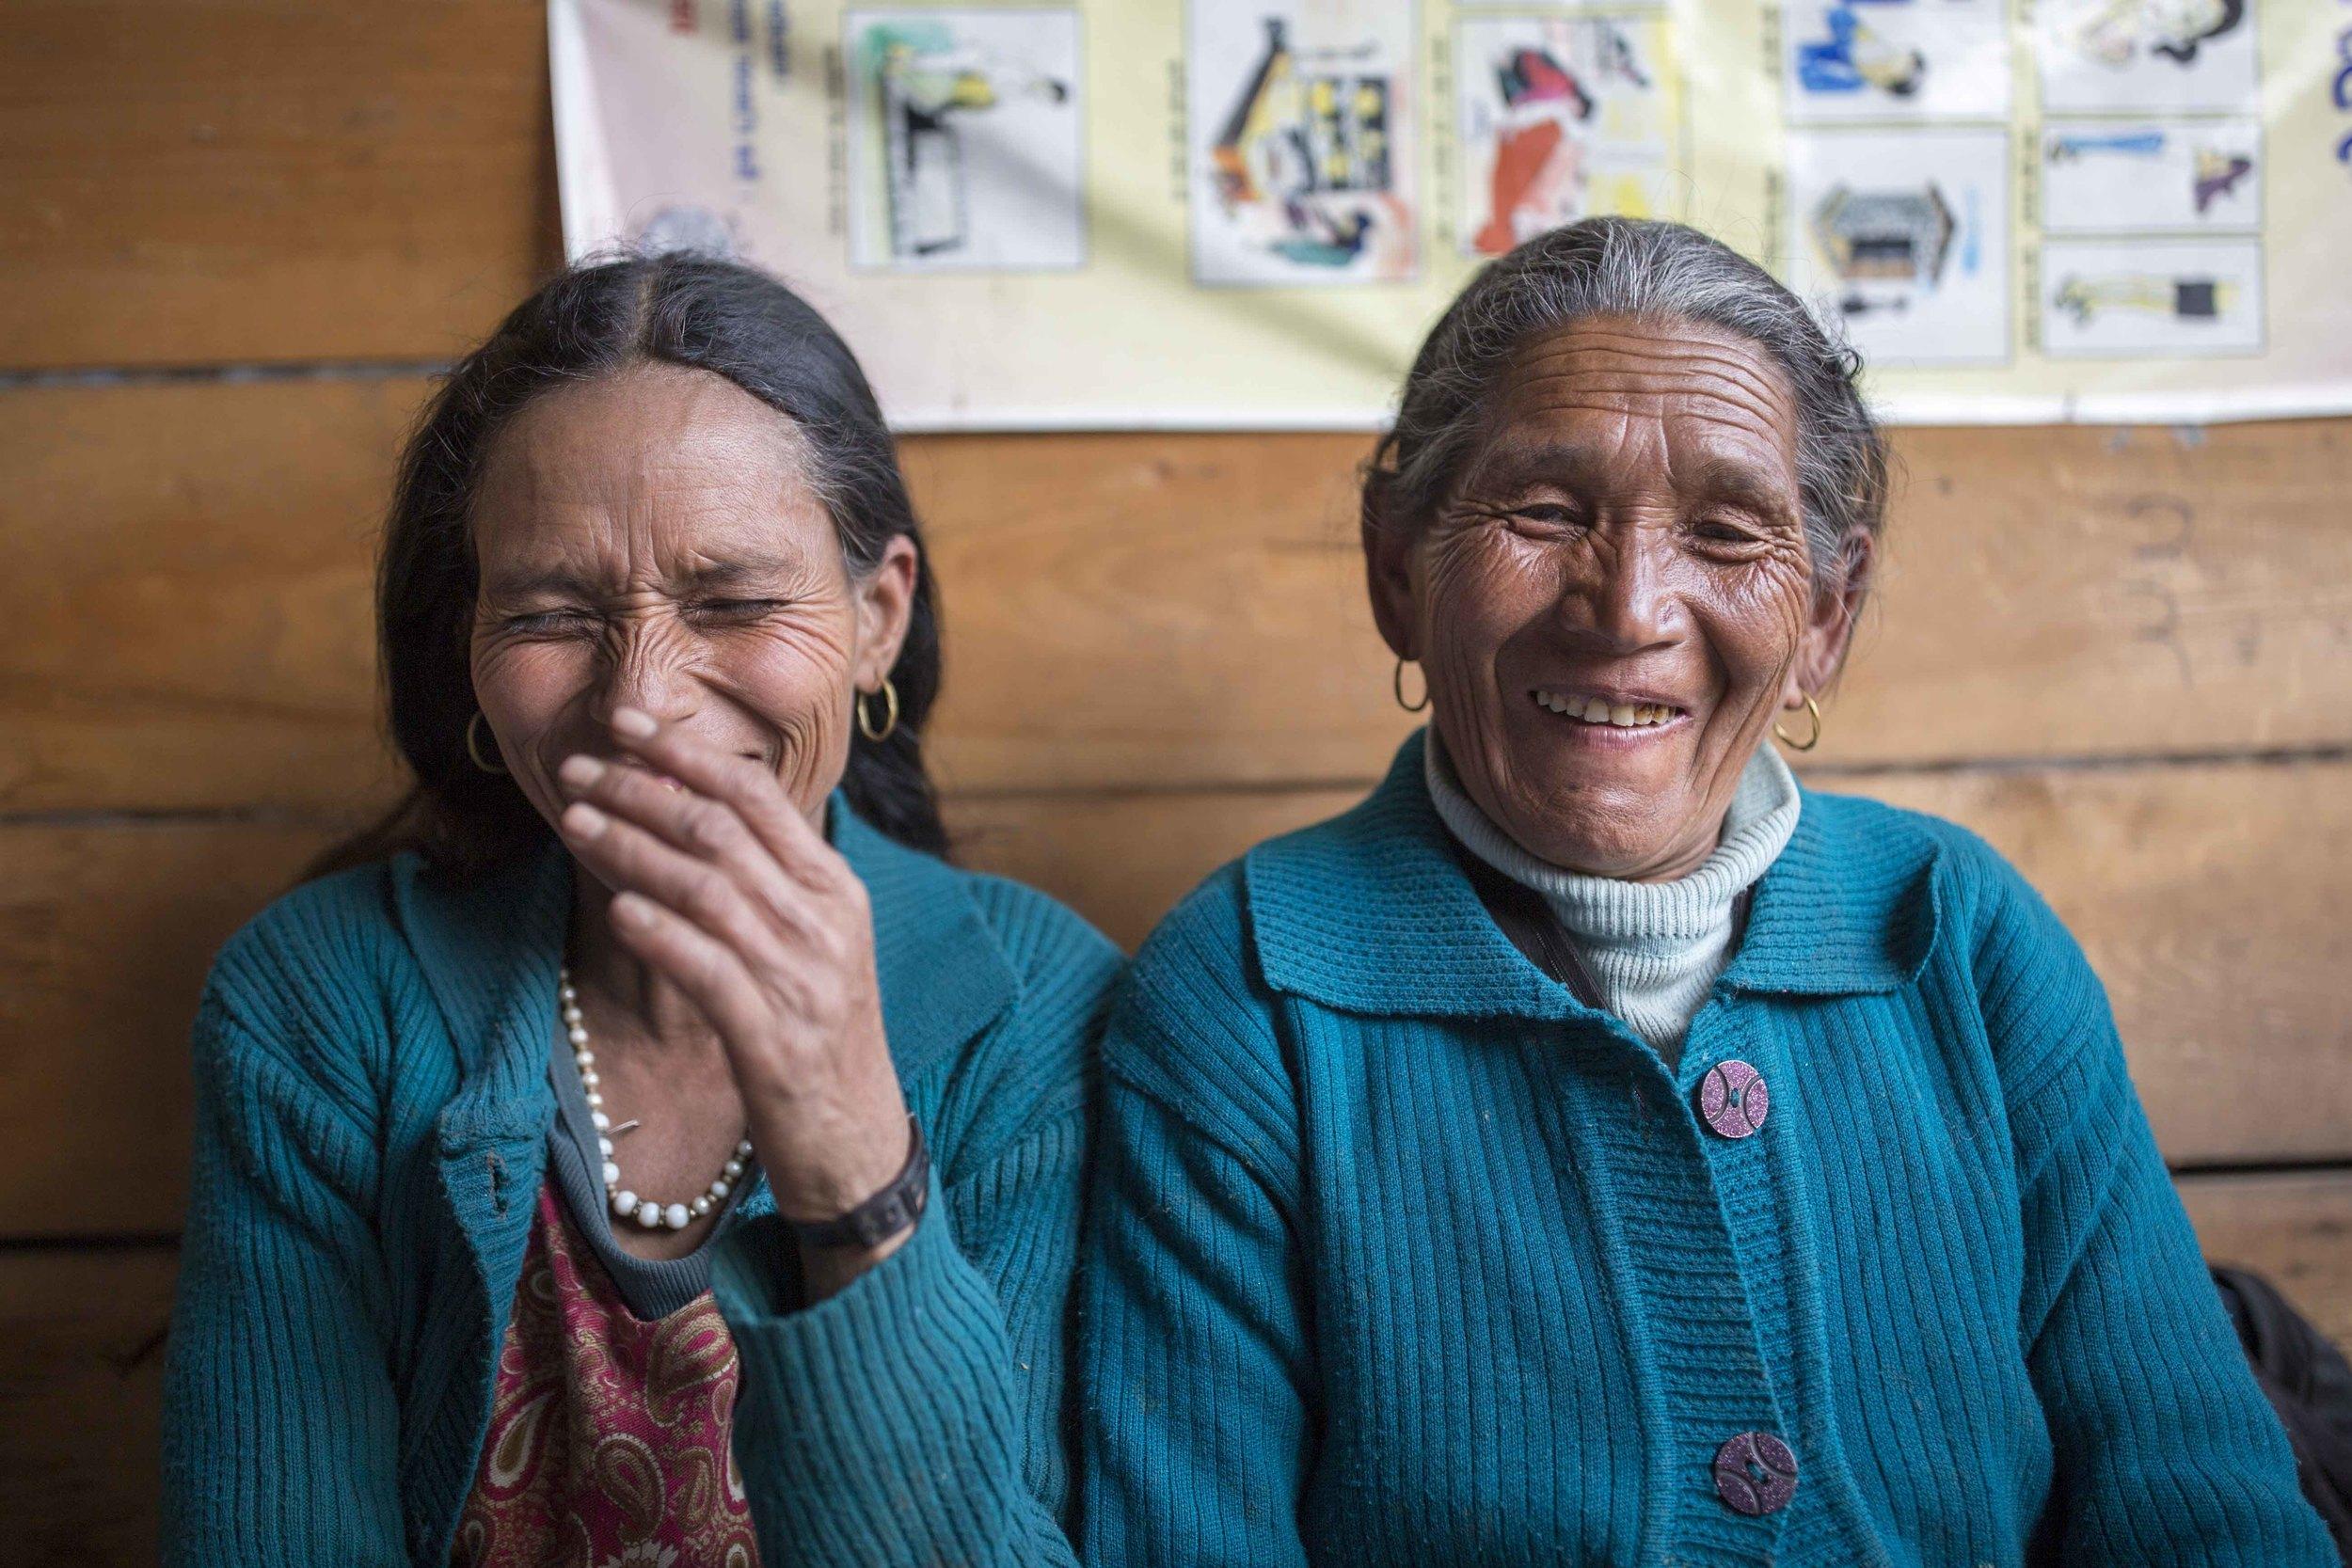 Nepal photos website updates (1 of 1)-3.jpg